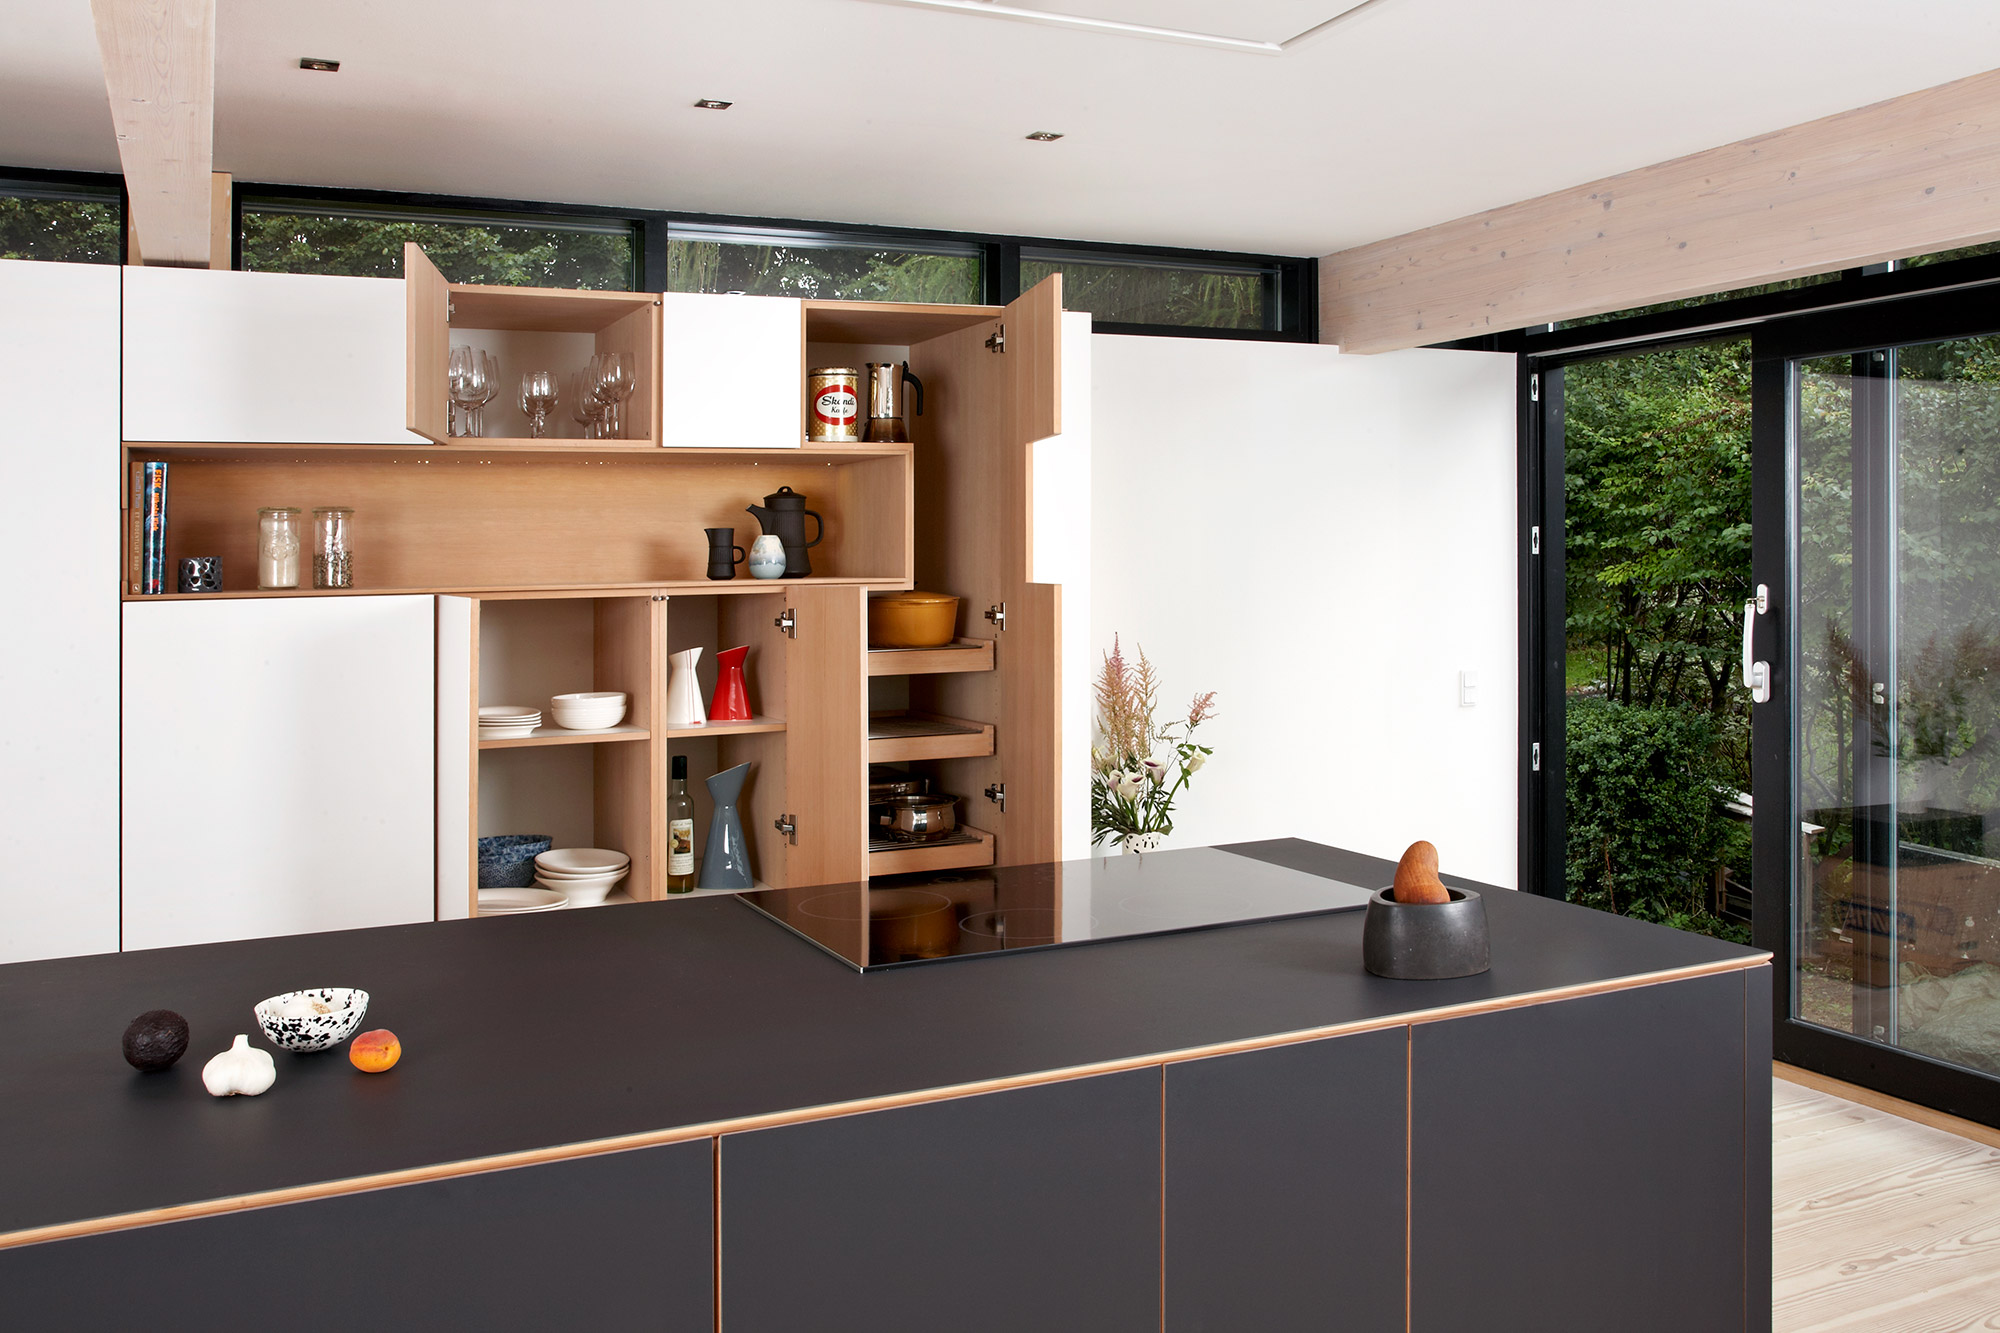 Snedkerkøkkenet Steen Blichersvej - designet og produceret af Nicolaj Bo™